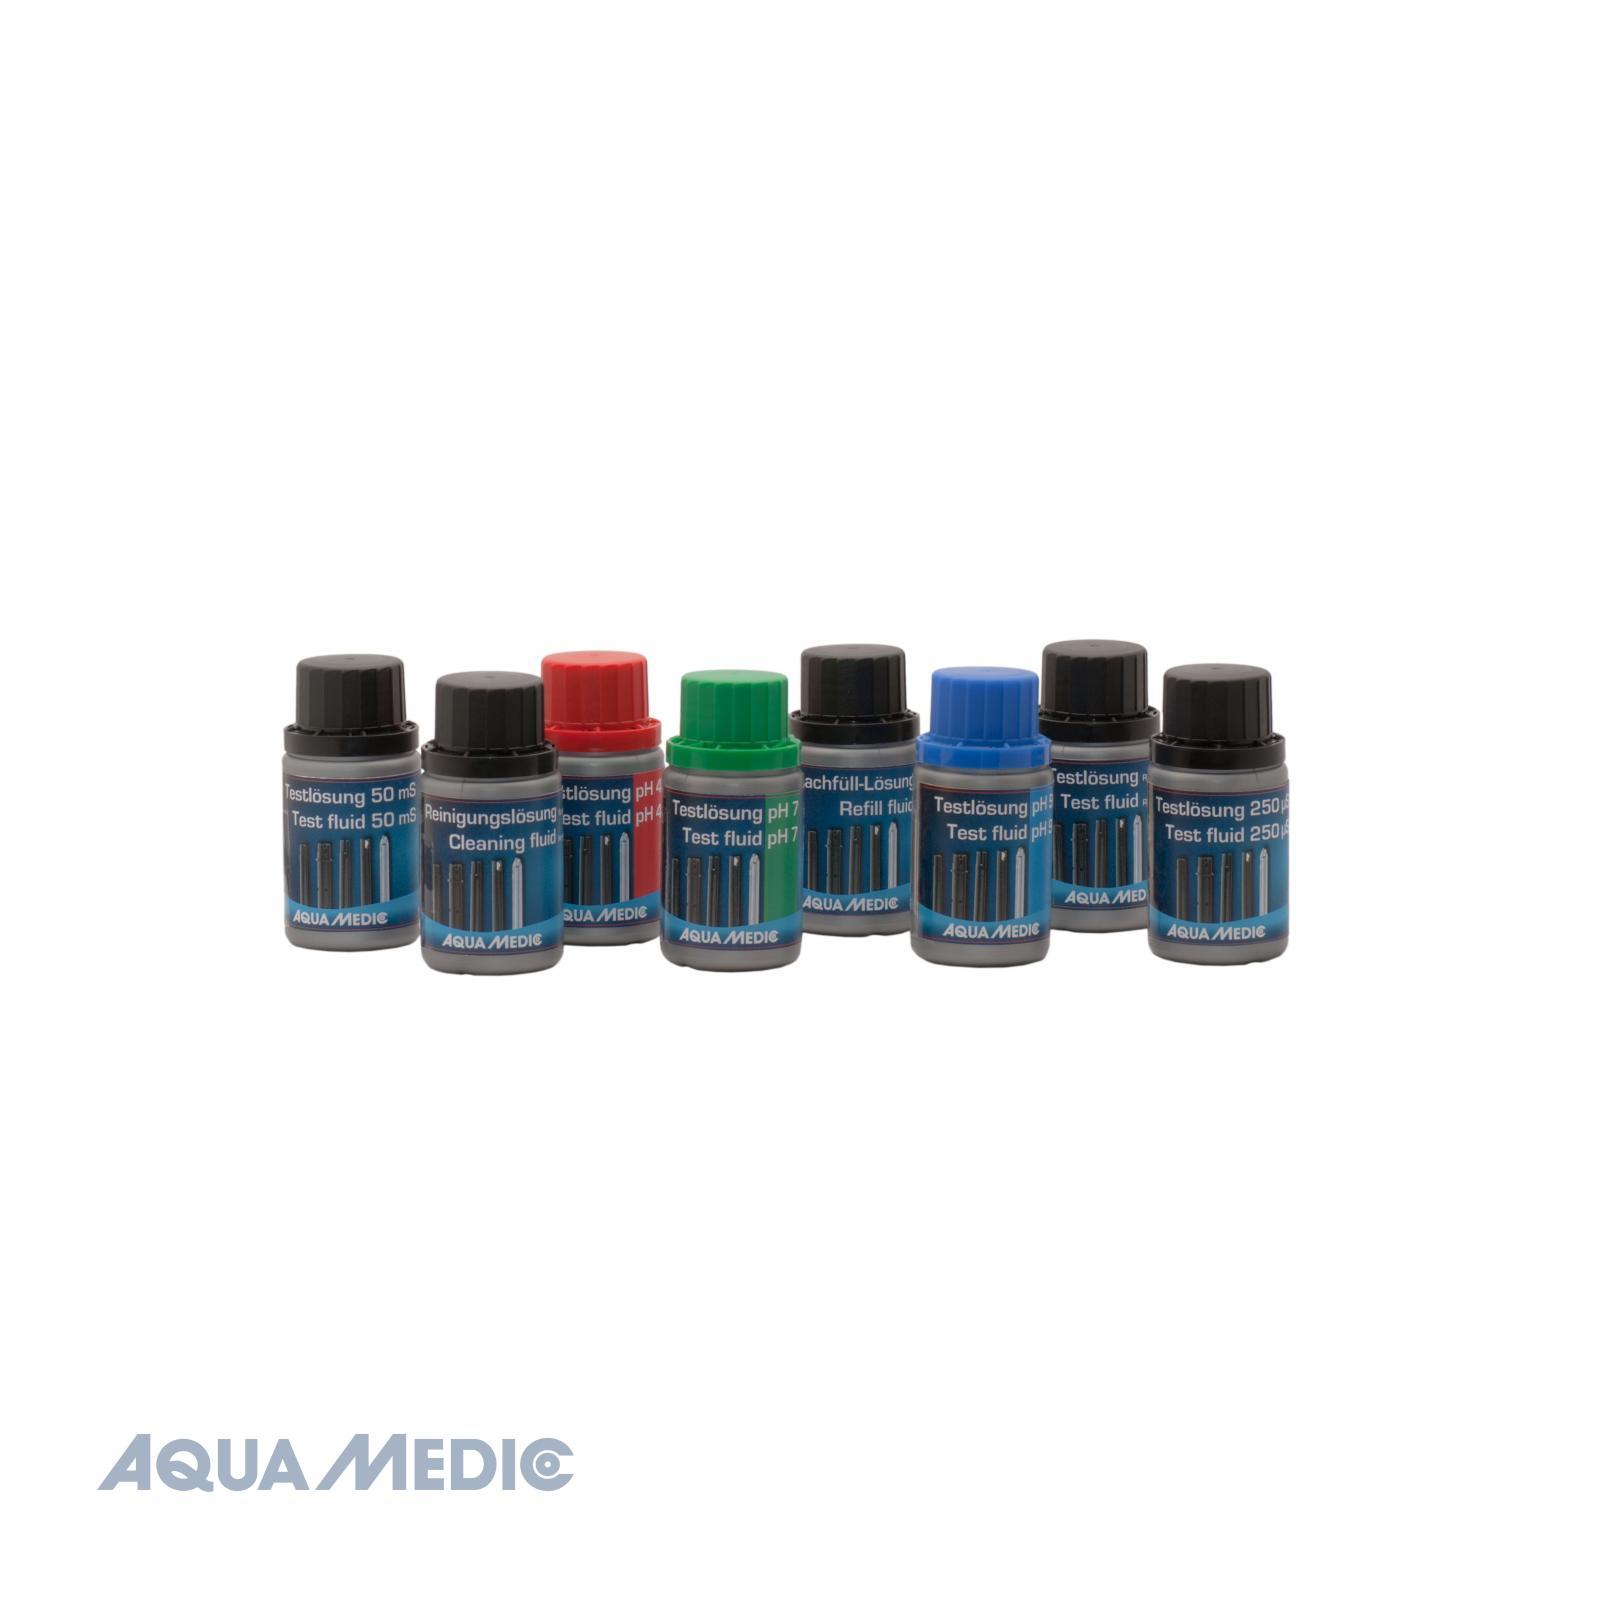 pH 7 Testlösung 60 ml